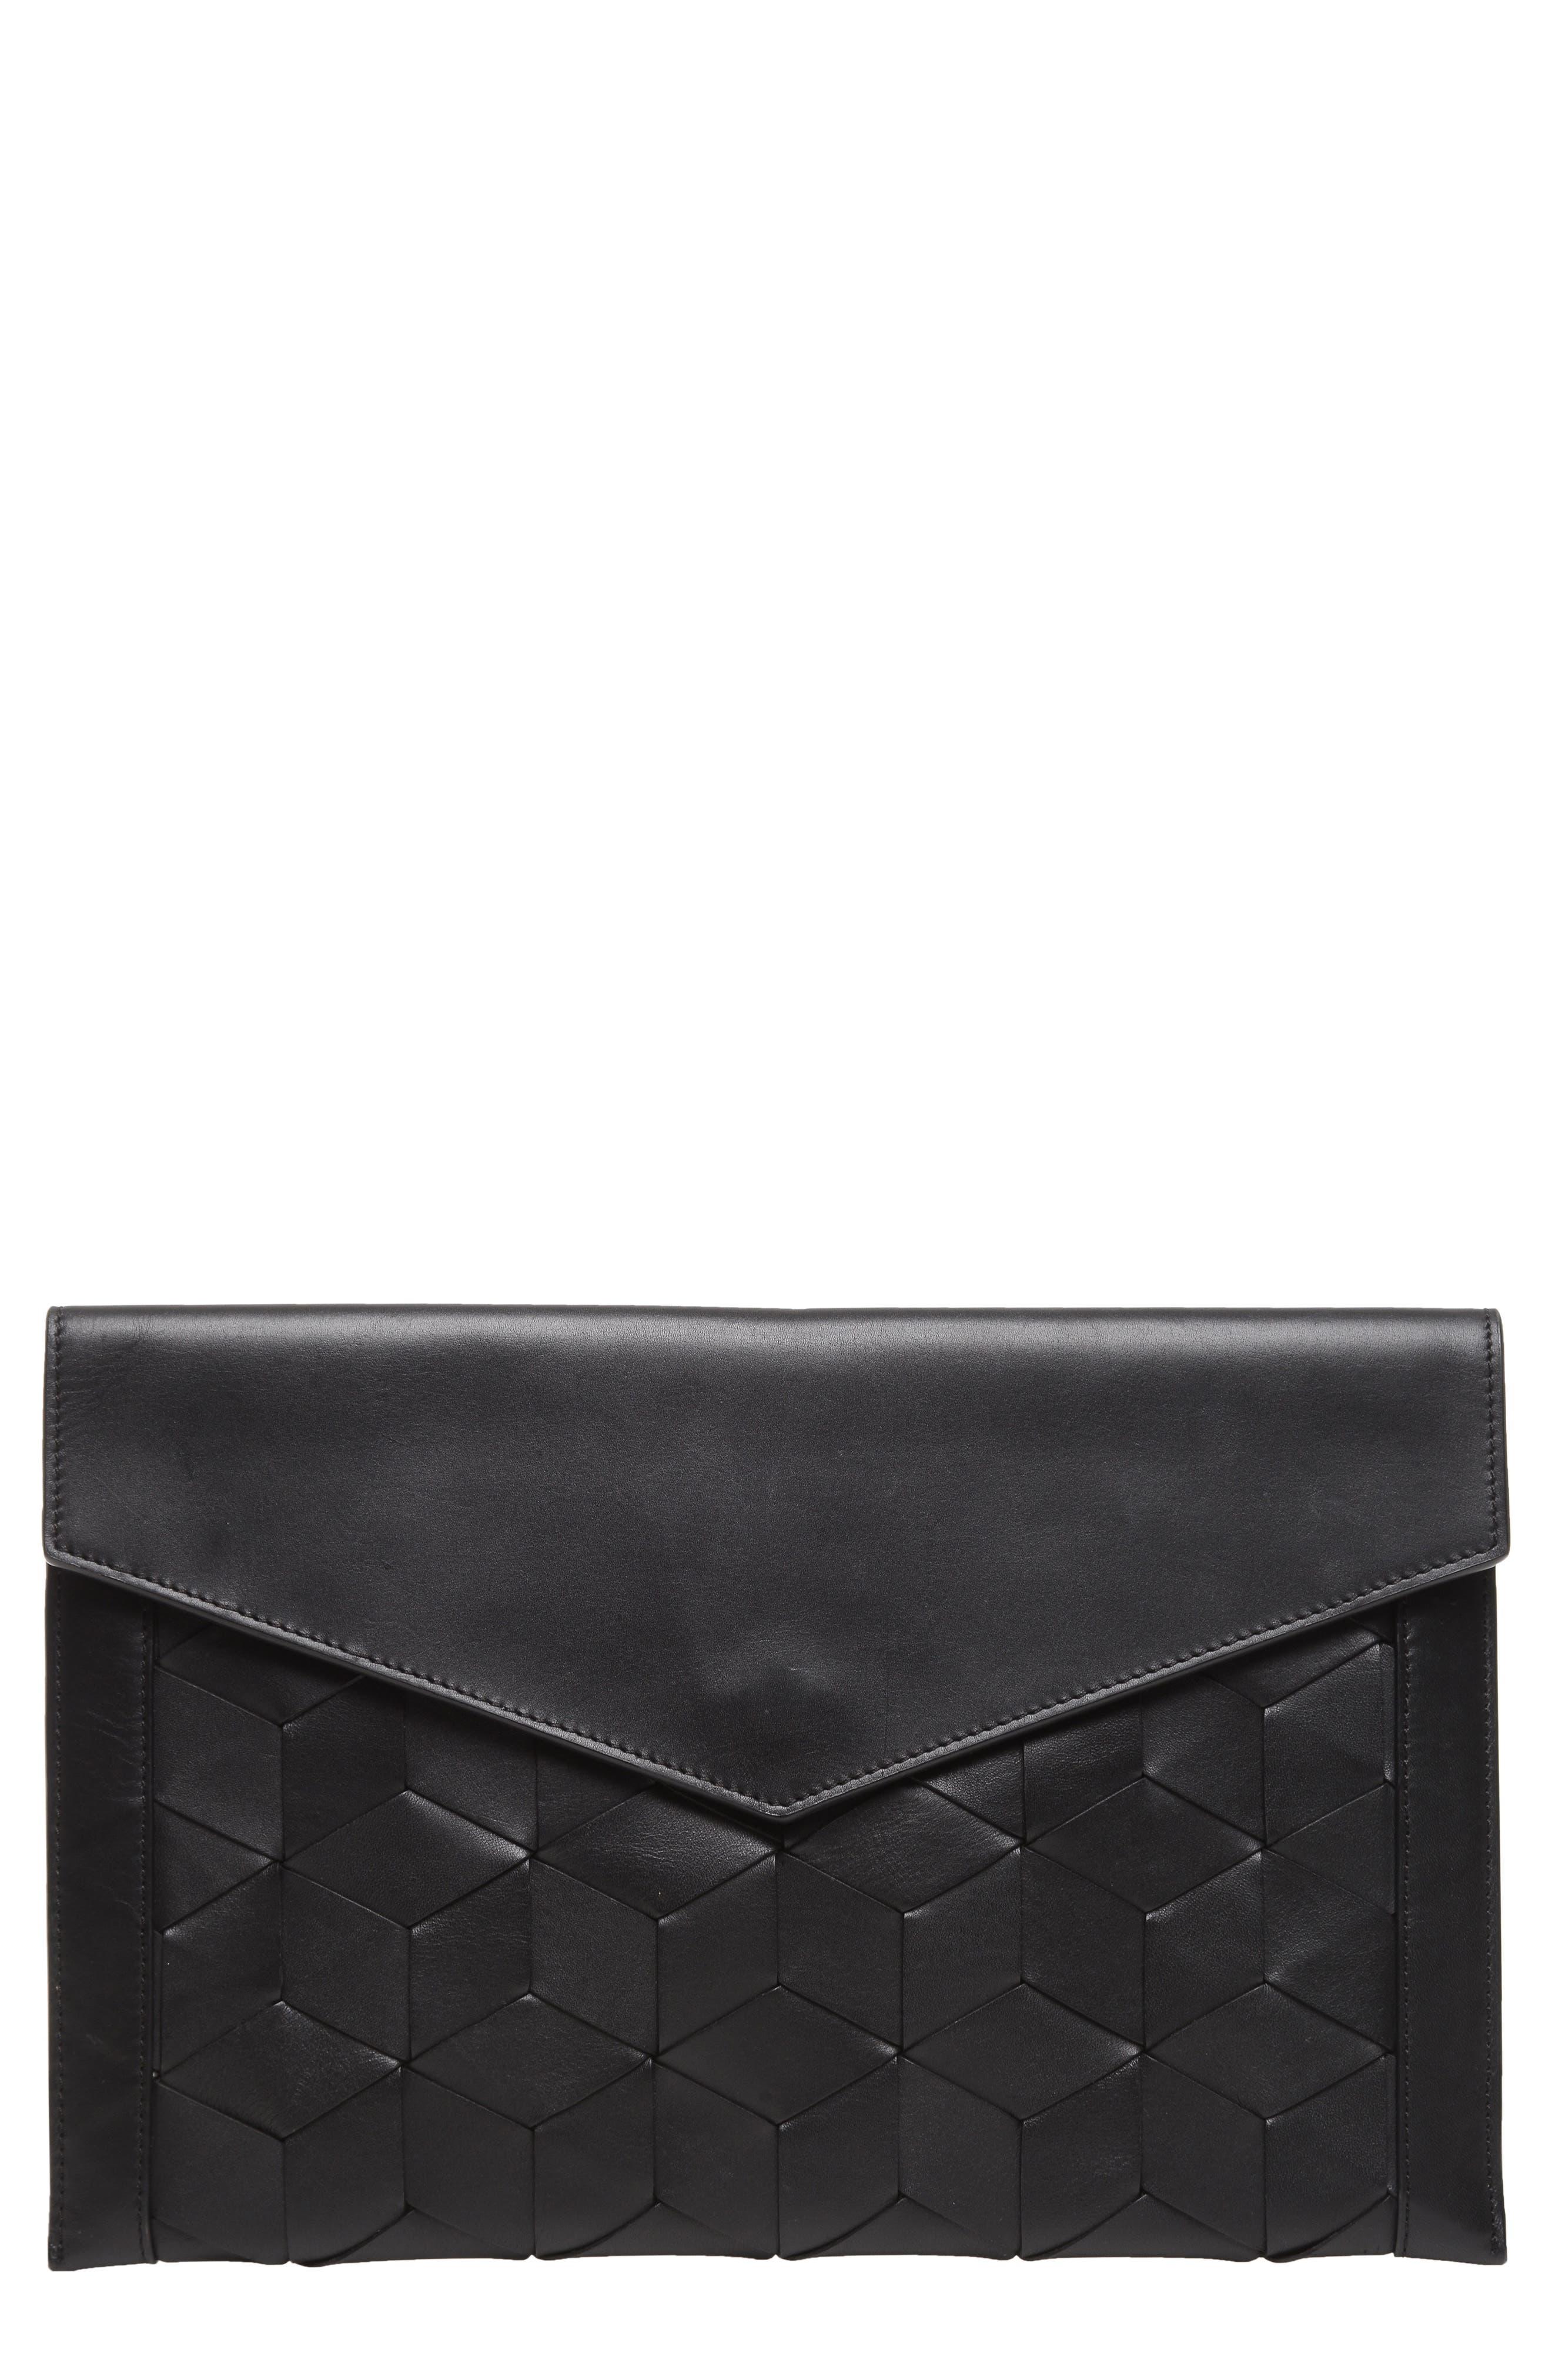 Mingle Woven Calfskin Leather Clutch,                             Main thumbnail 1, color,                             BLACK